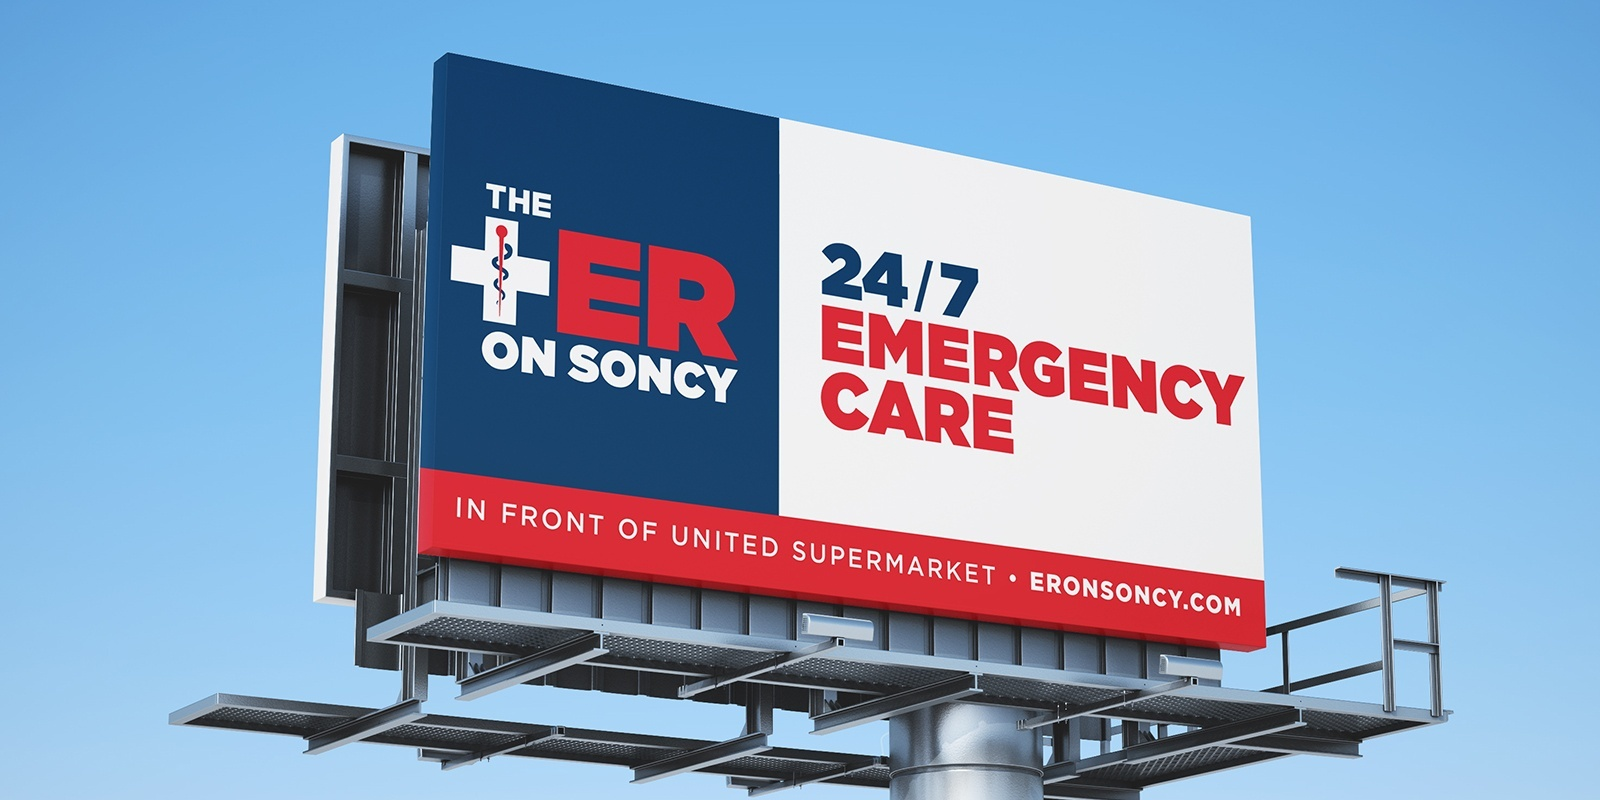 The ER on Soncy